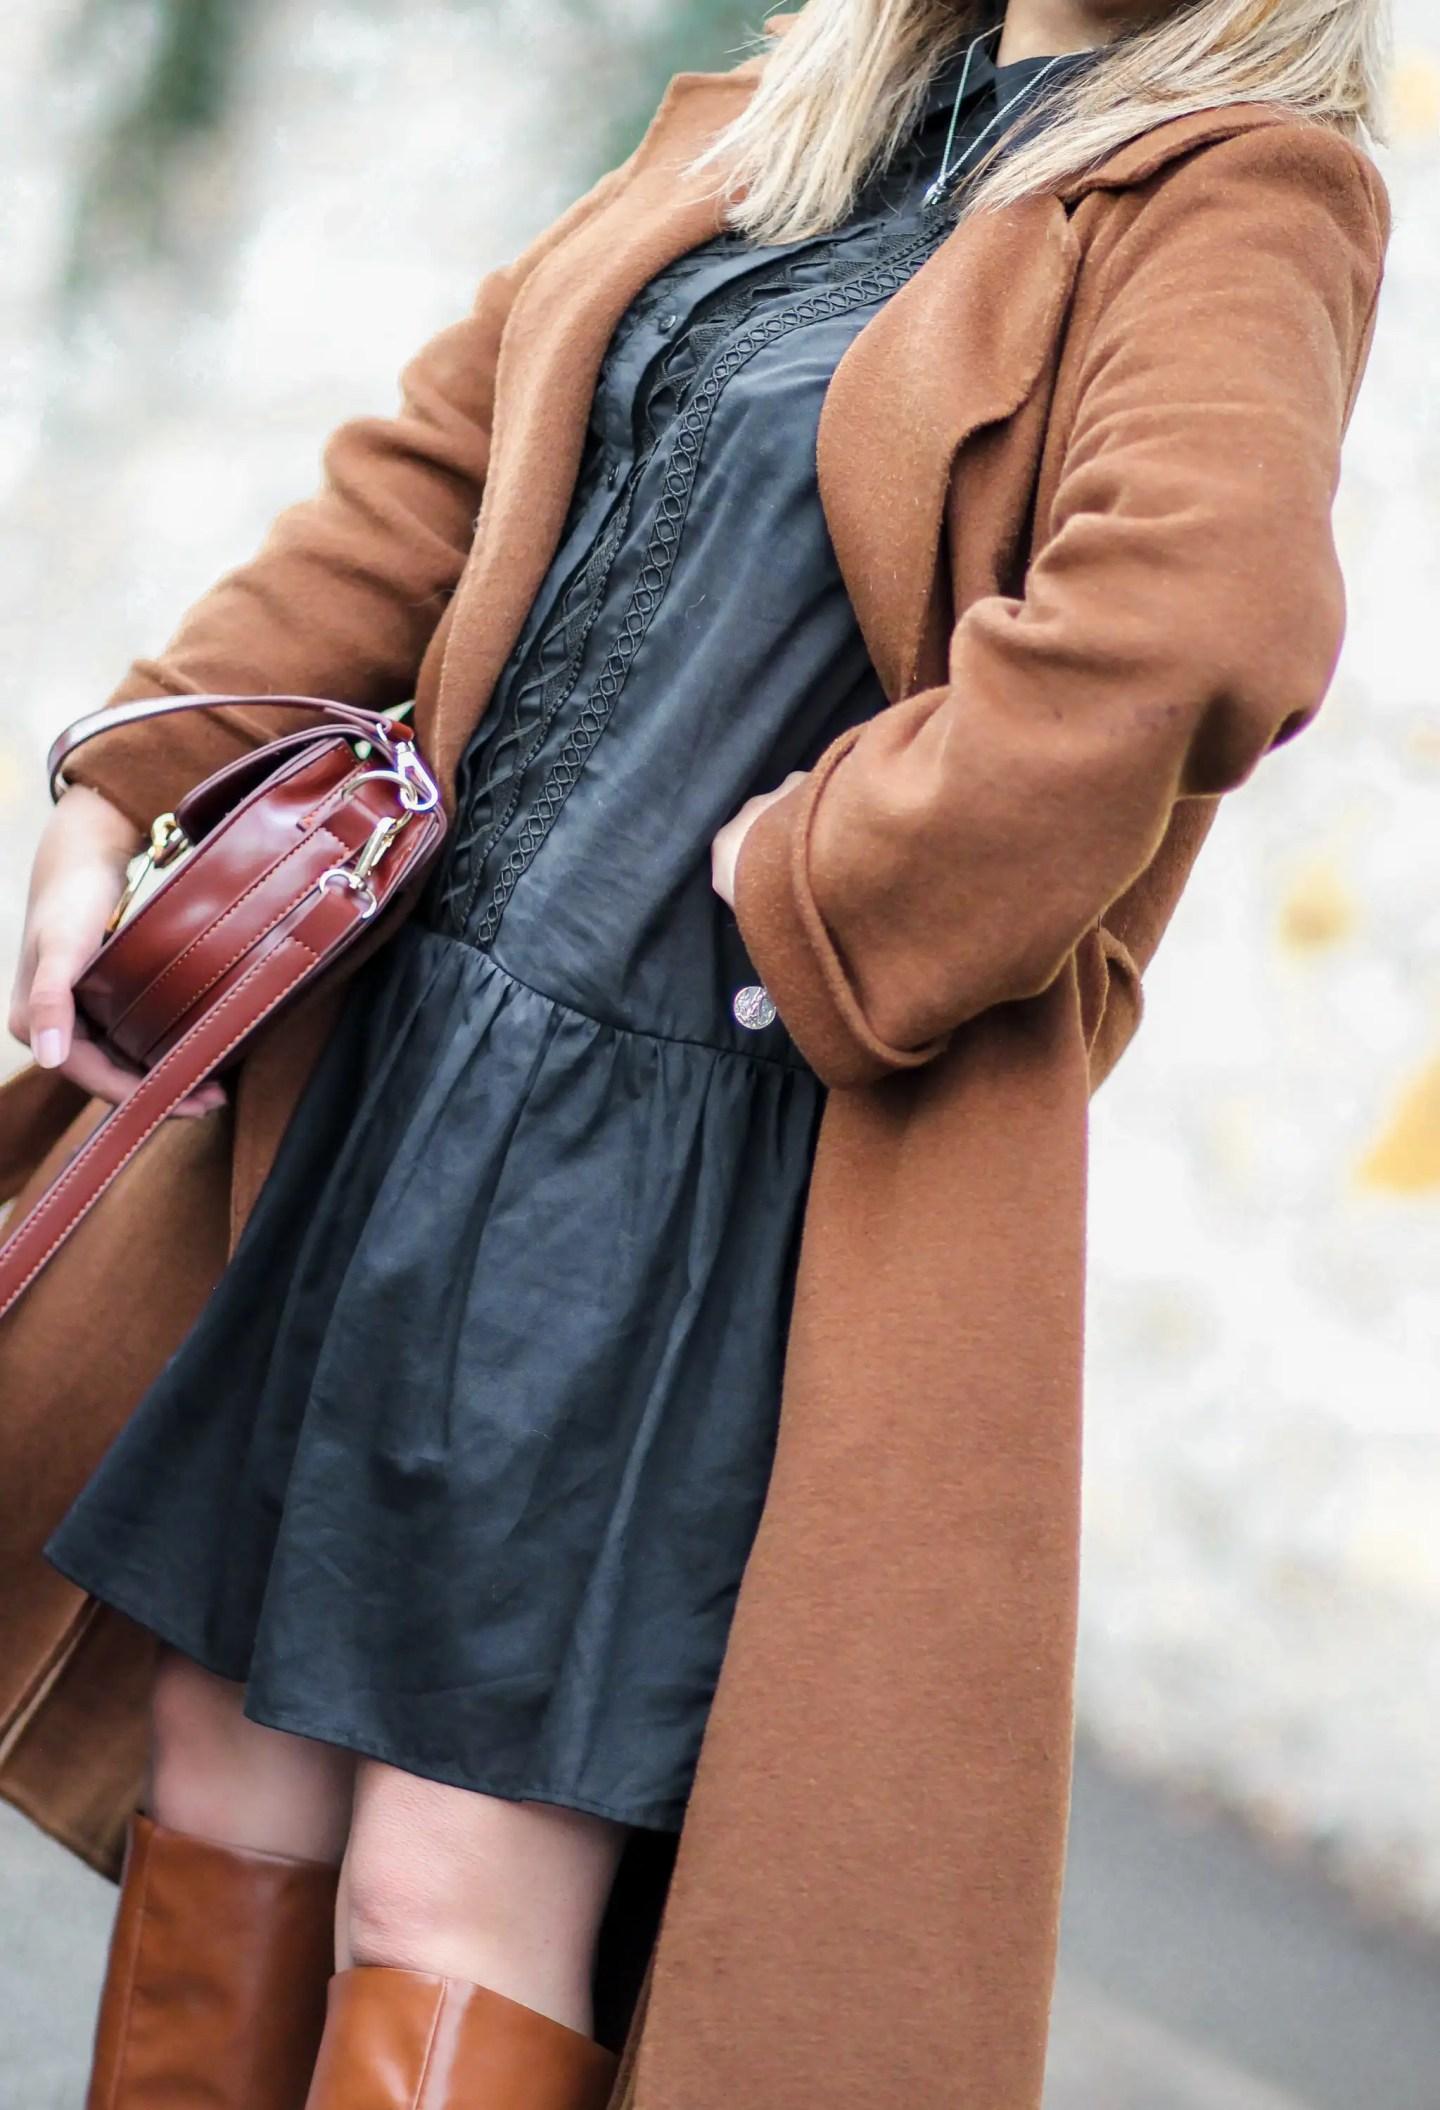 zara, manteau zara, manteau camel, the green ananas, blog mode, pinterest, tendance mode, blogueuse mode, bottes camel, hm, tess chloé, robe noire, la petite robe noire & new hair